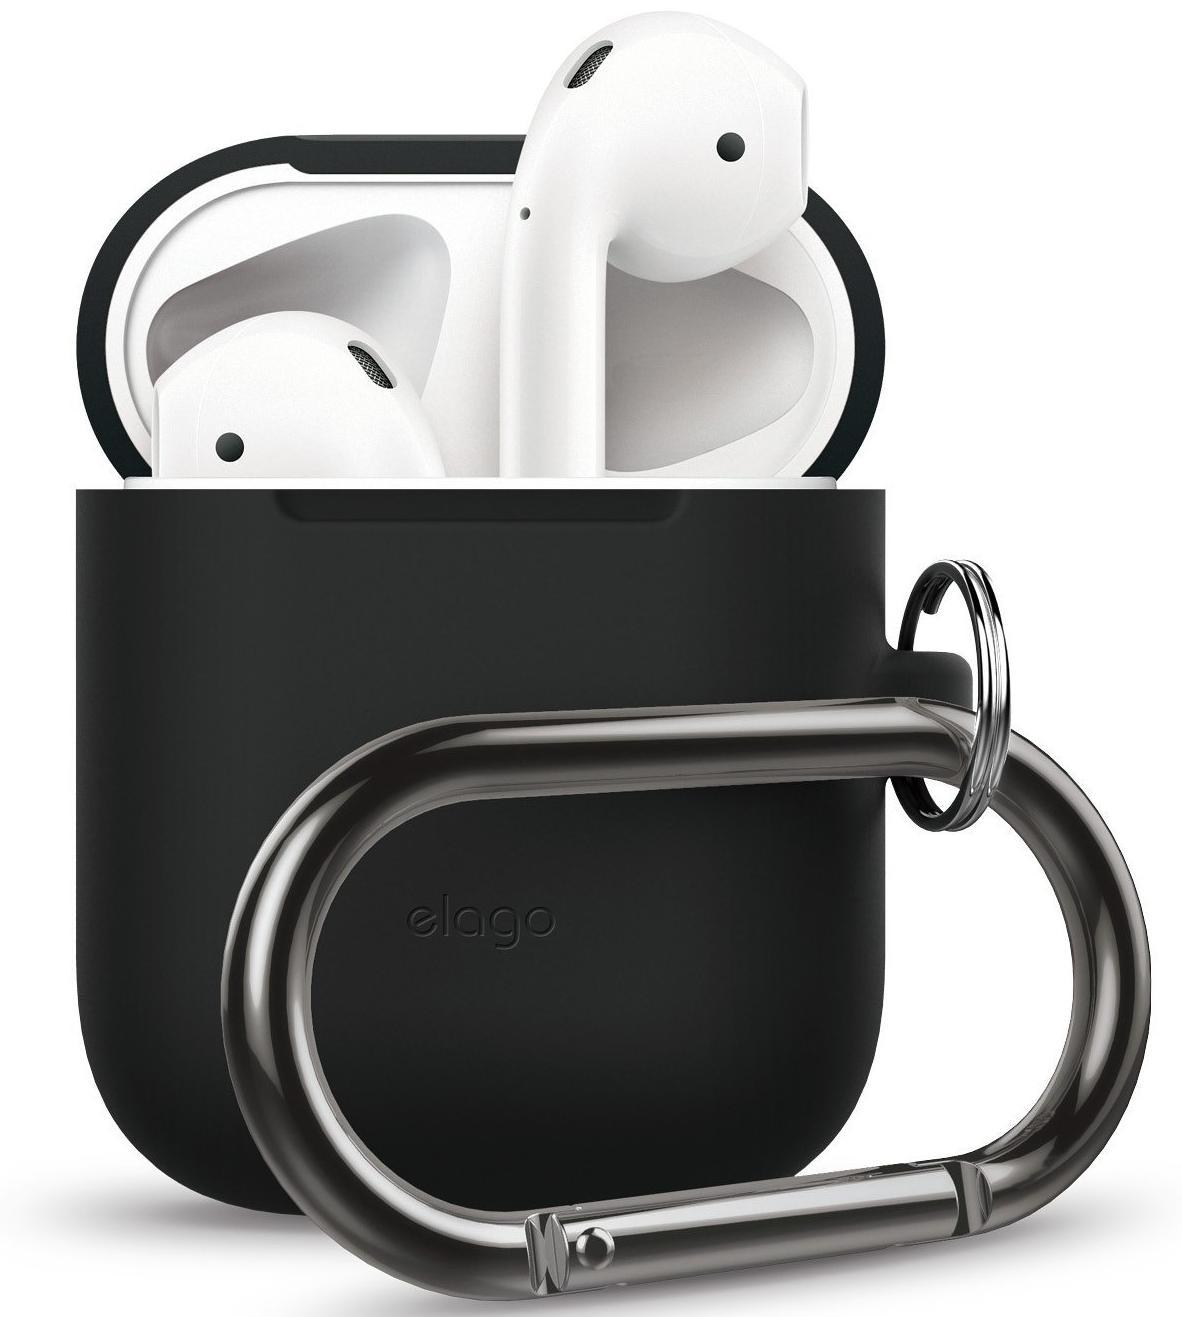 Чехол Elago AirPods Hang Case (EAPSC-HANG-BK) для зарядного кейса AirPods (Black) фото